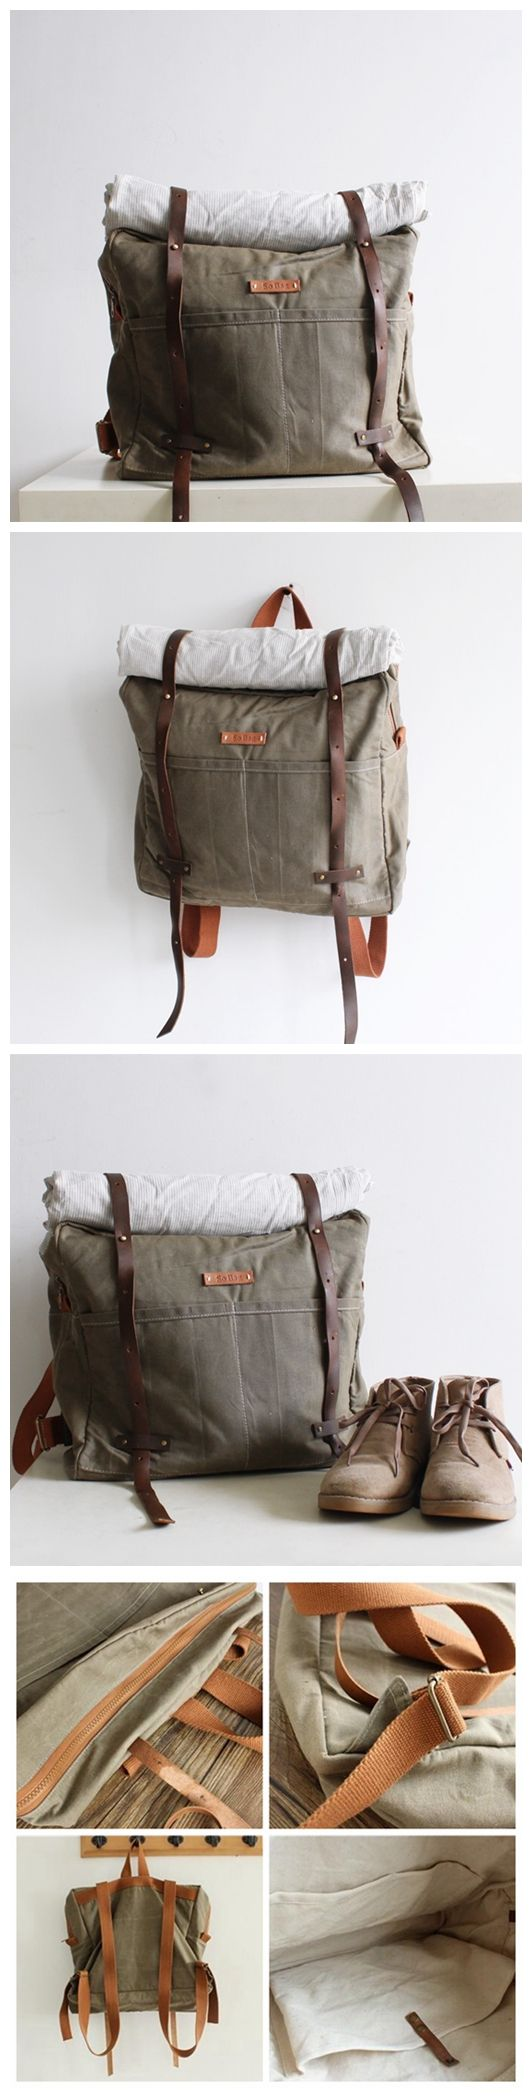 Handmade Waxed Canvas School Backpack Travel Rucksack Vintage Canvas Backpack 14053